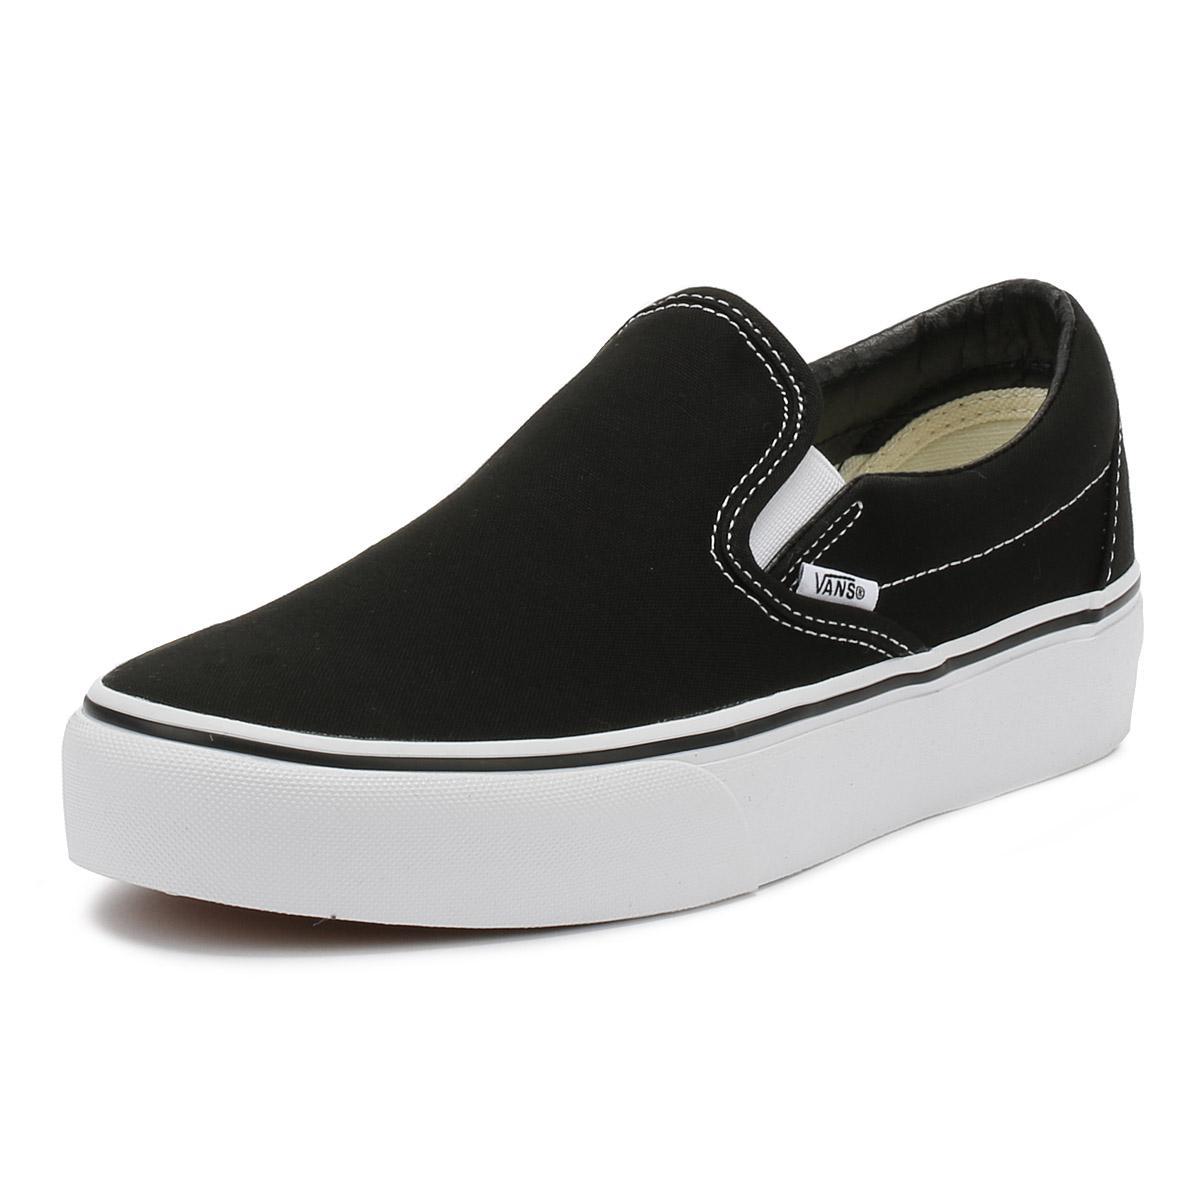 fe7f5037b28318 Vans - Womens Black Classic Slip On Platform Trainers for Men - Lyst. View  fullscreen